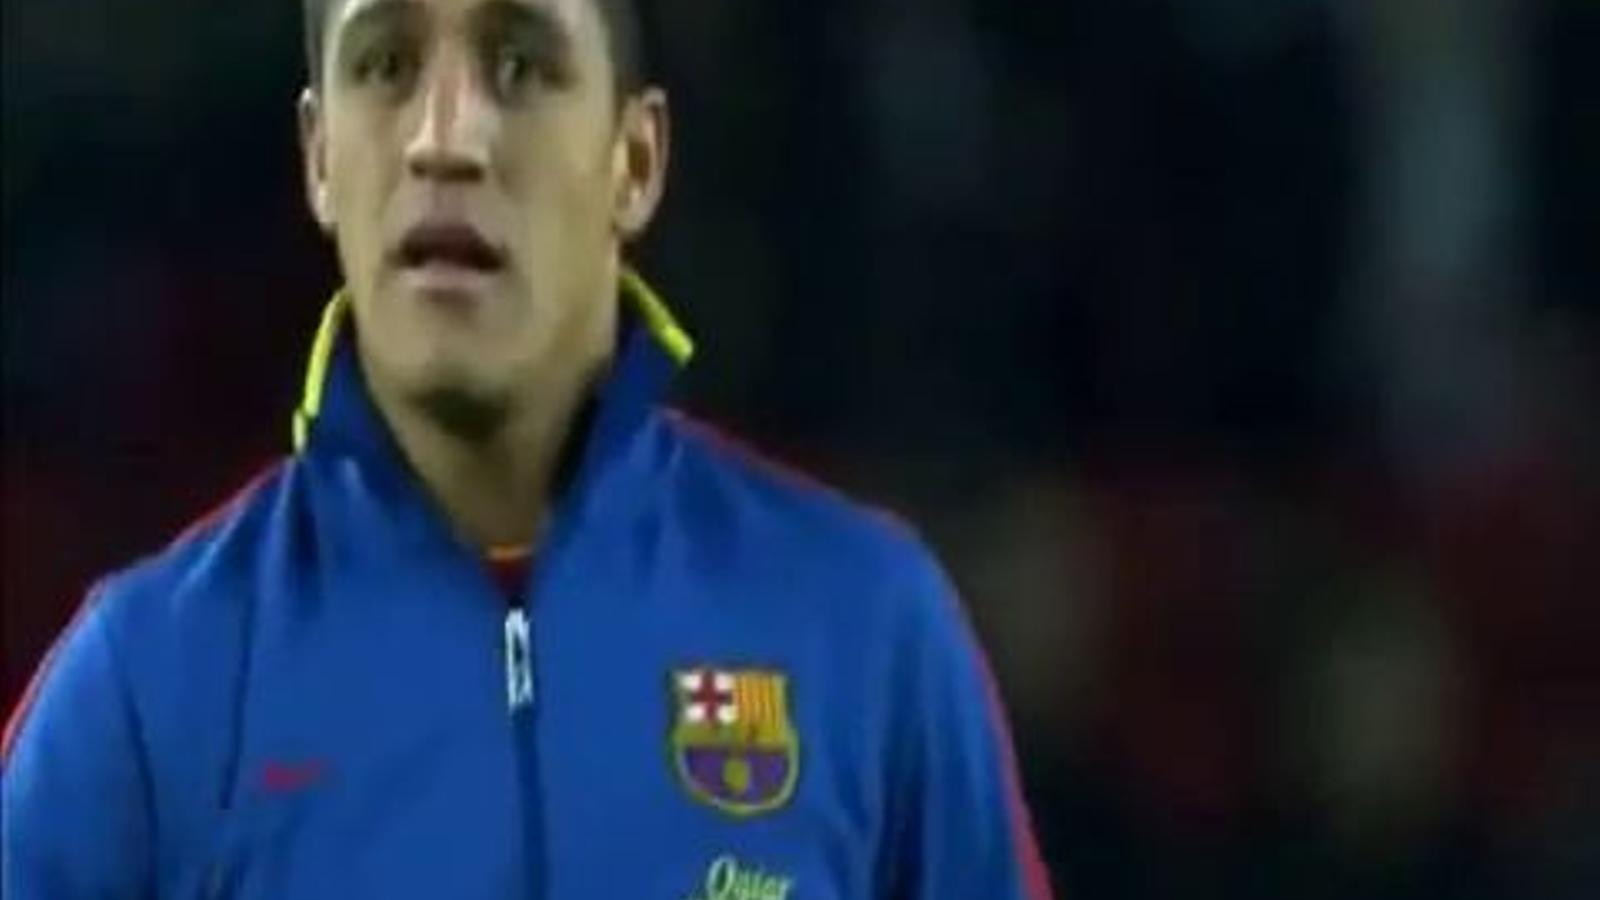 Barça, 'clear eyes, full hearts'